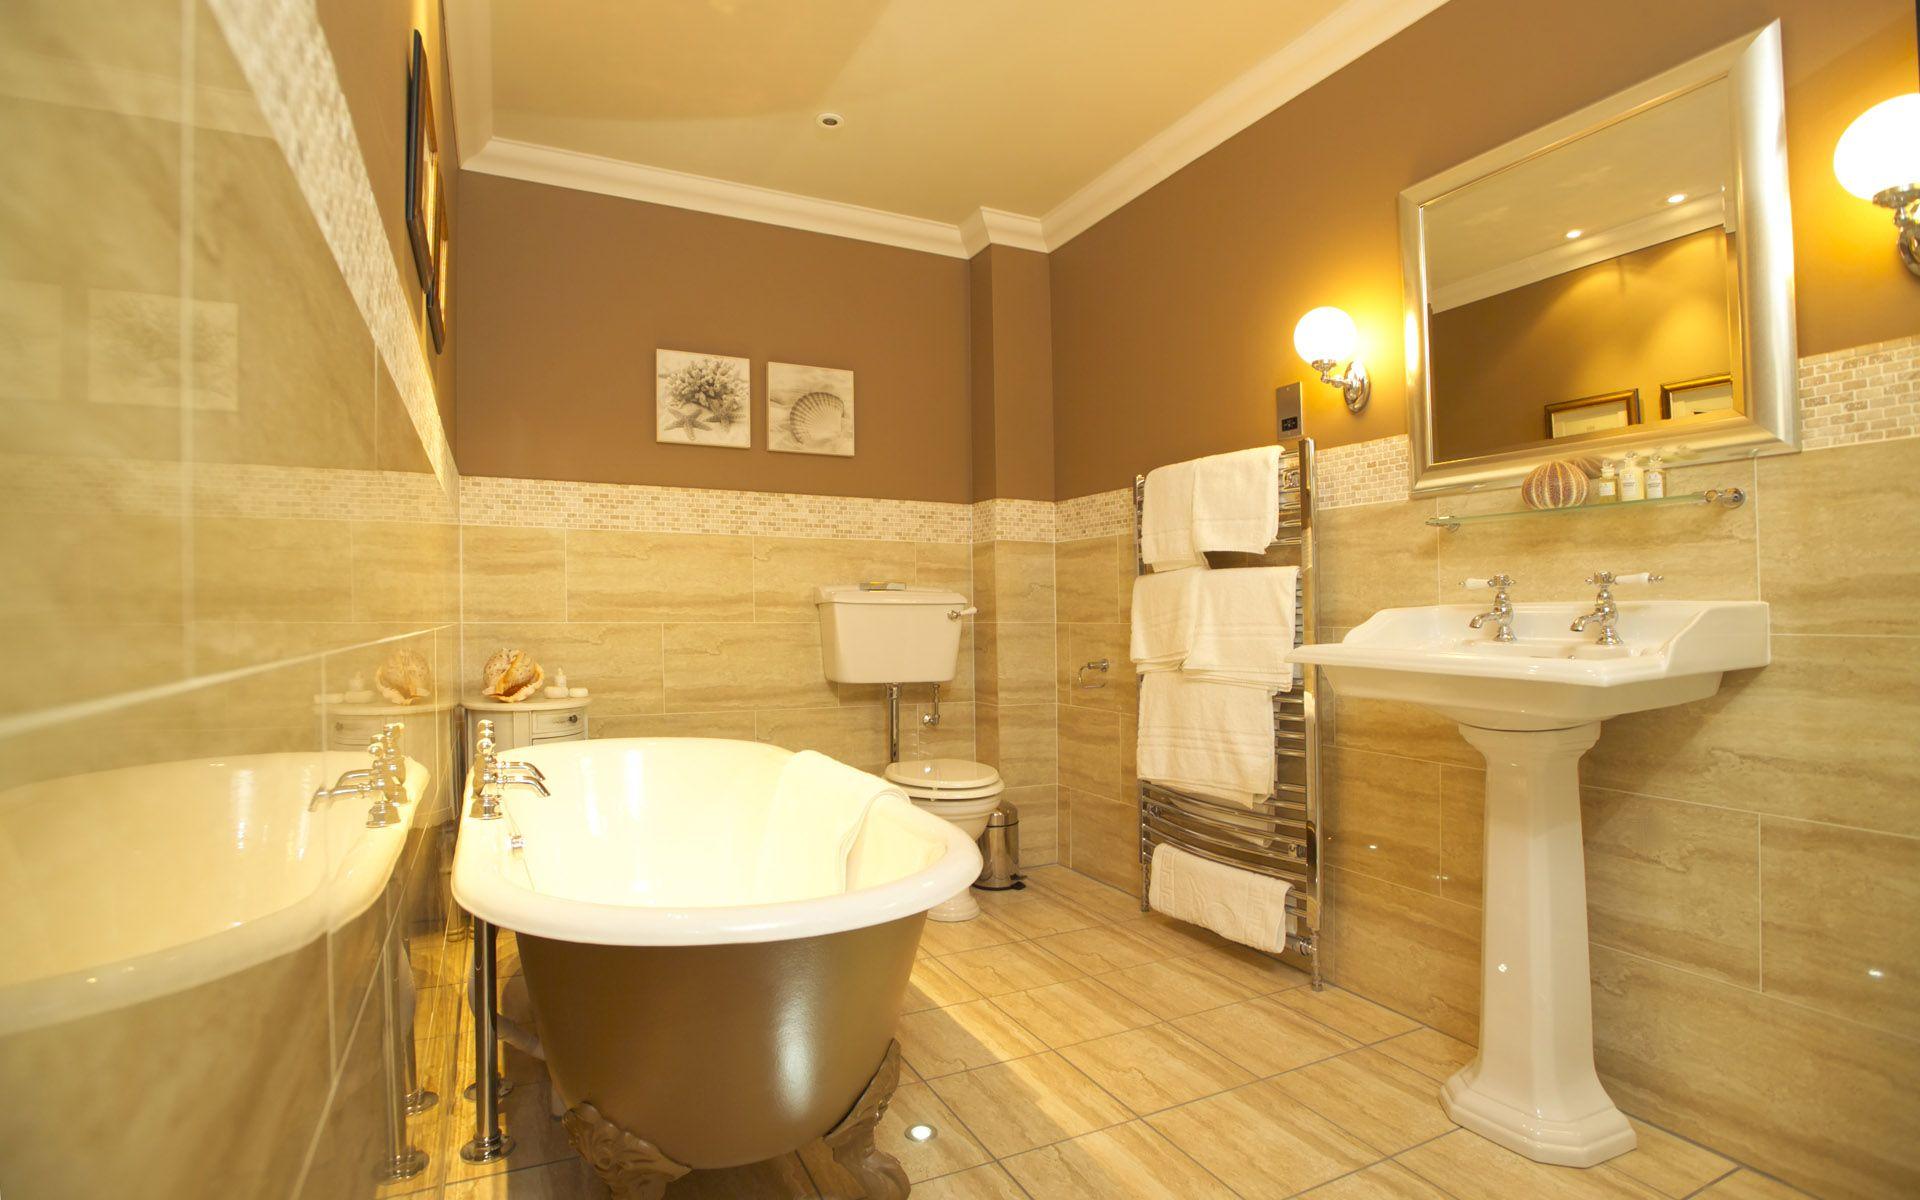 25+ Cool And Stylish Small Bathroom Design Ideas   Small bathroom ...